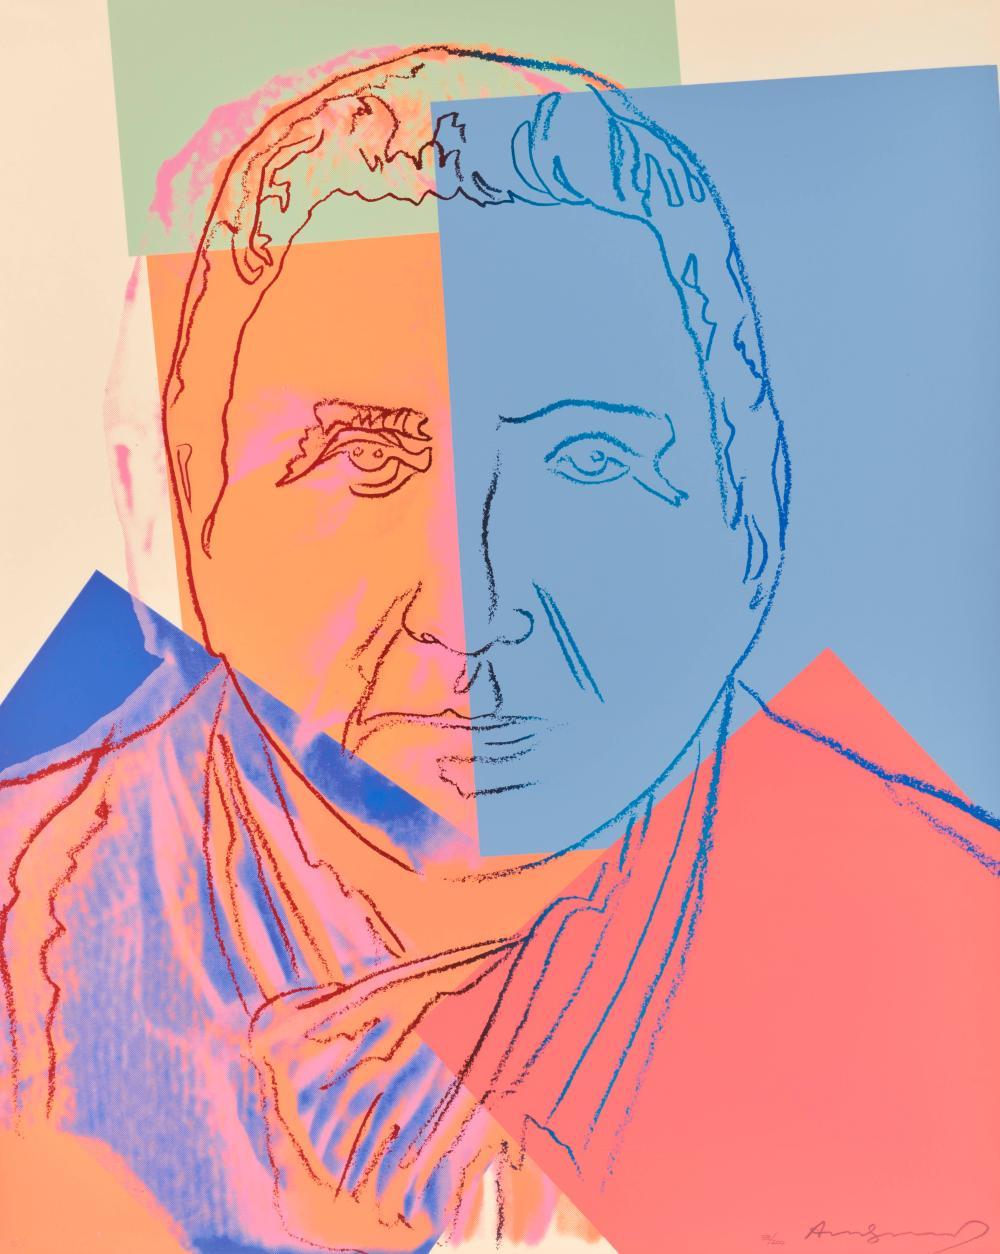 ANDY WARHOL, (American, 1928-1987), Gertrude Stein (F. & S. II.227), 1980, screenprint, sheet: 40 x 32 in., frame: 42 x 34 in.